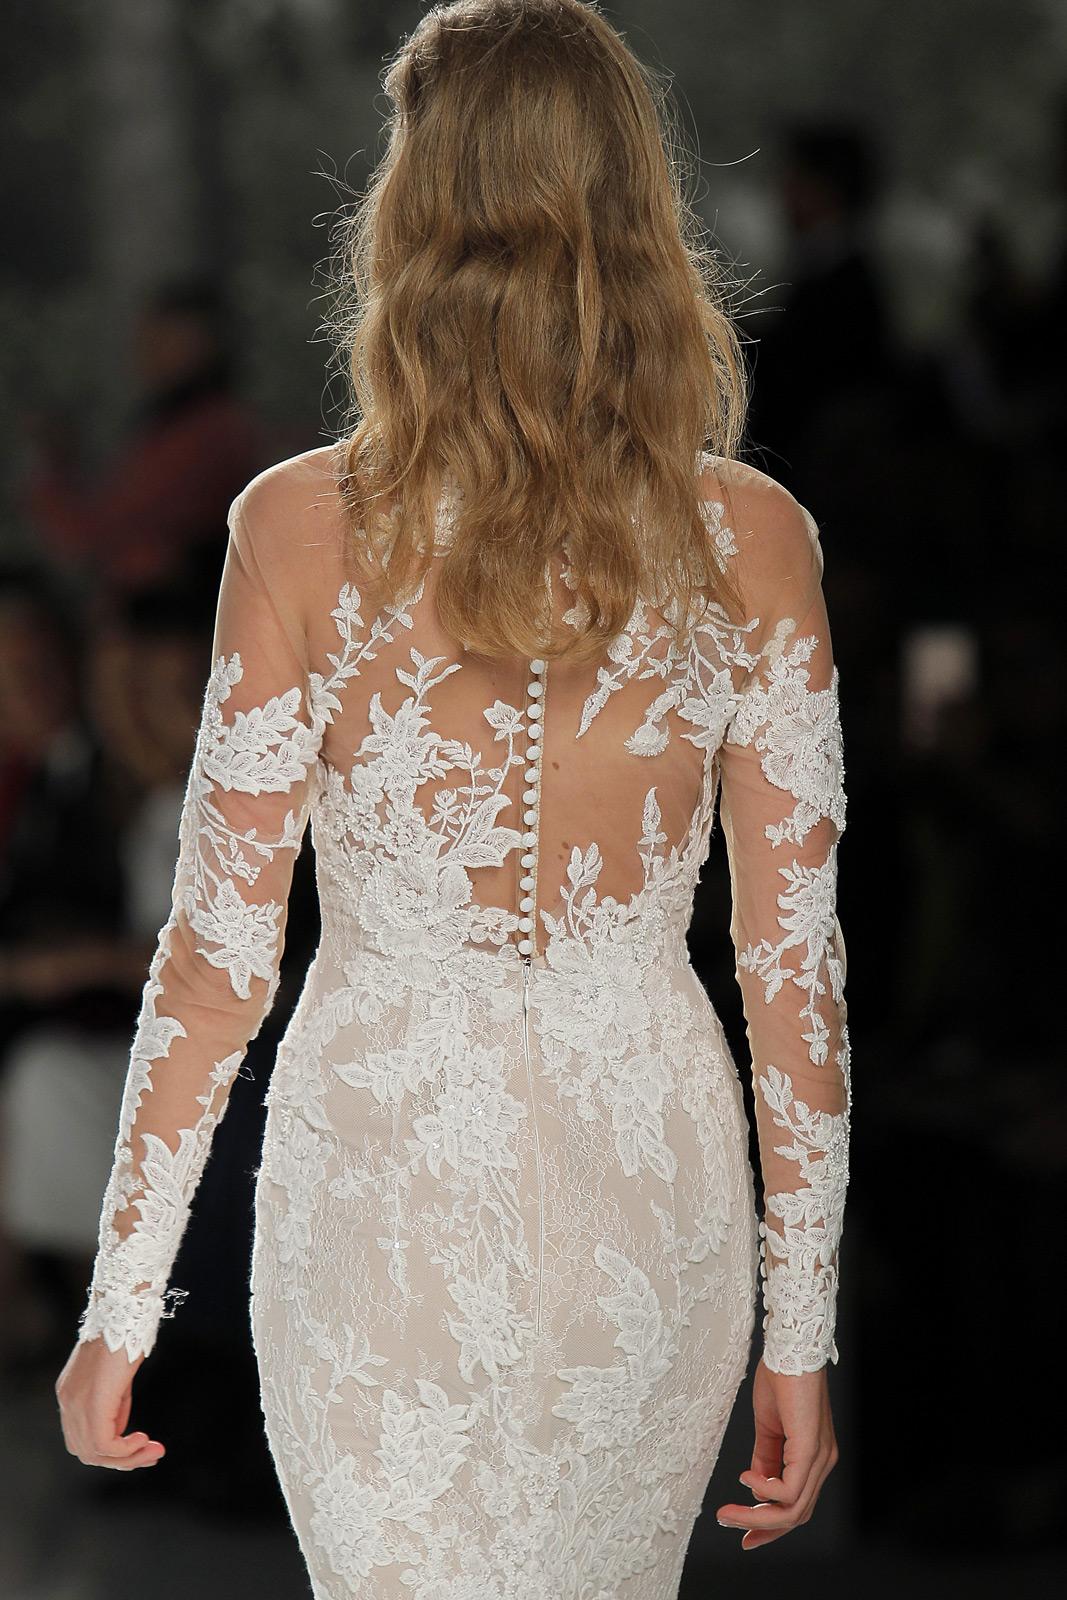 Vestido con manga larga de Studio St. Patrick. Fotografía: Barcelona Bridal Fashion Week.